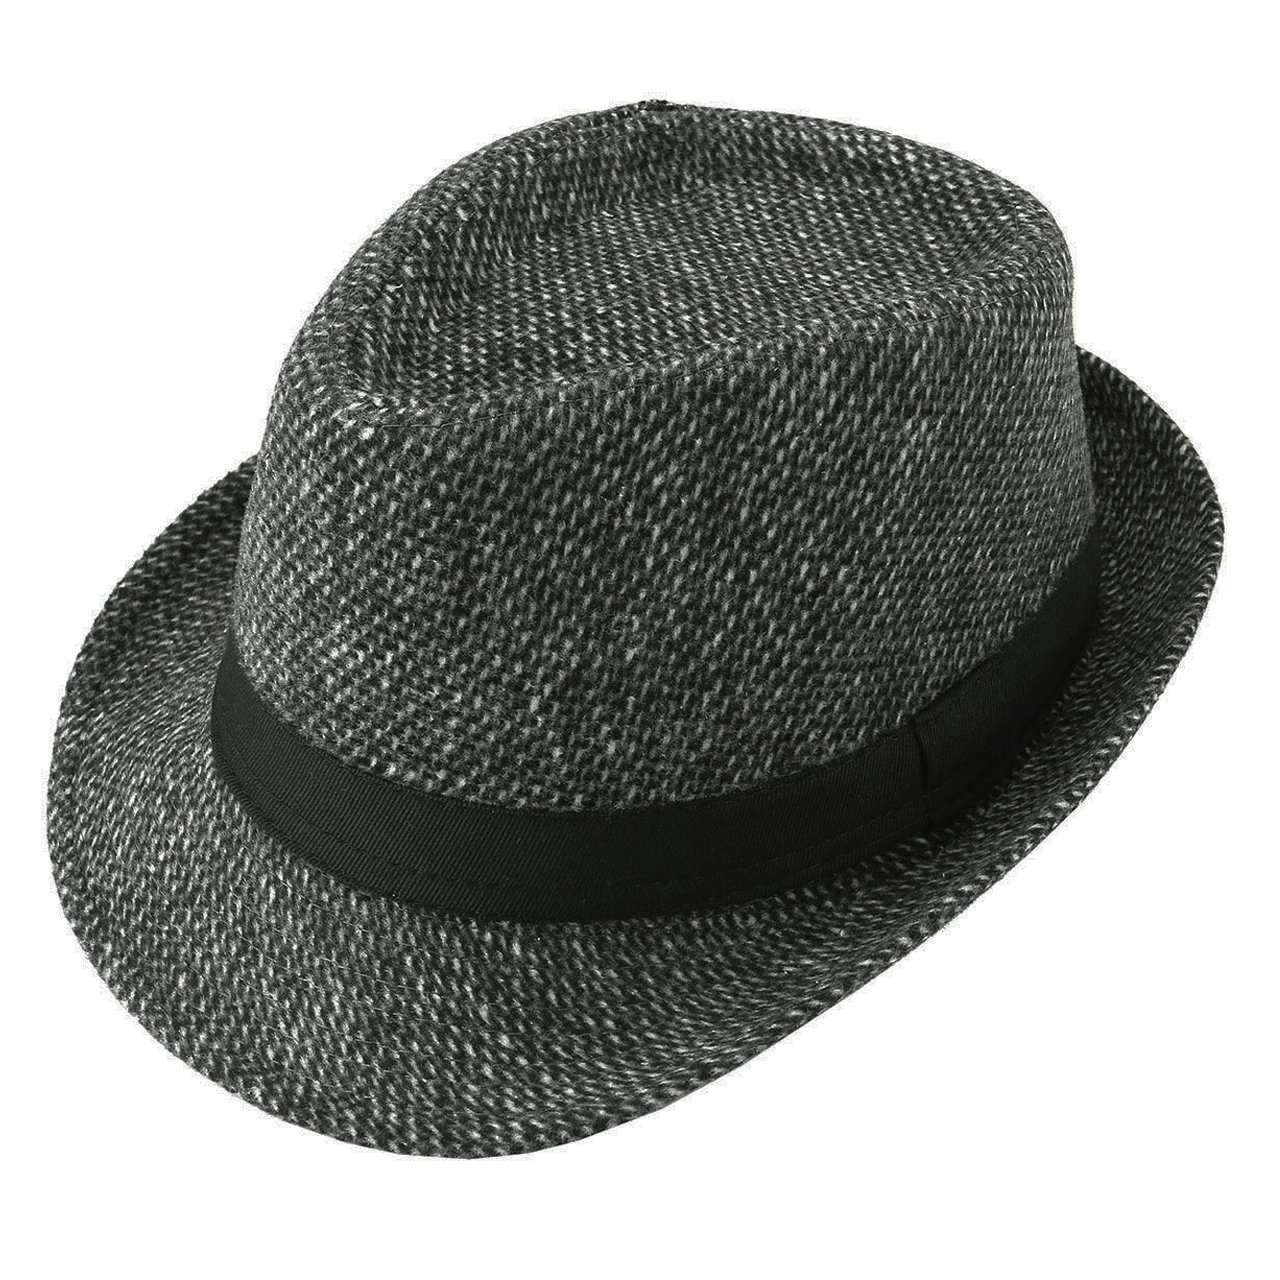 Unisex Classic Manhattan Fedora Hat Black Band Fashion Casual Jazz Wool Cap (Dark Grey)